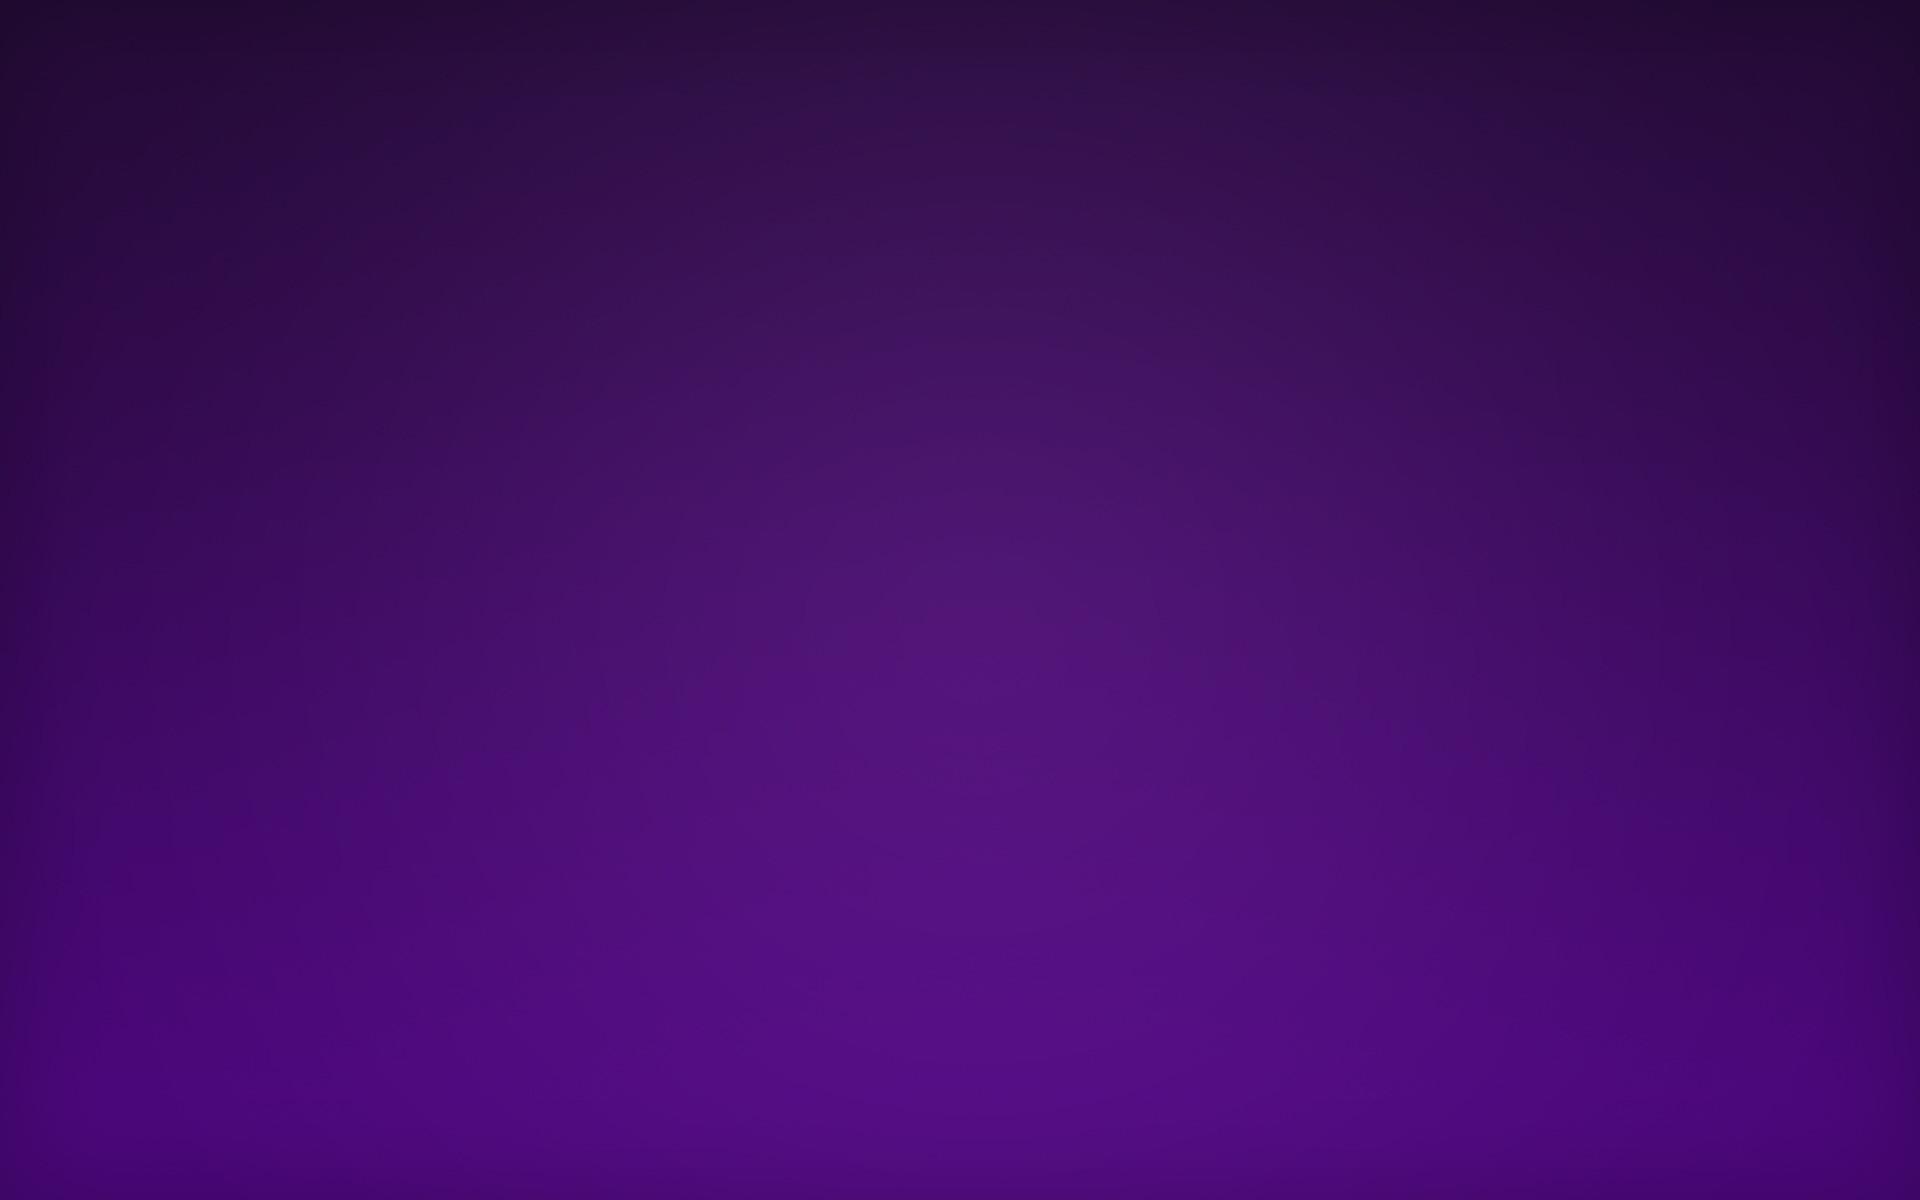 Plain Wallpaper for Desktop Purple (58+